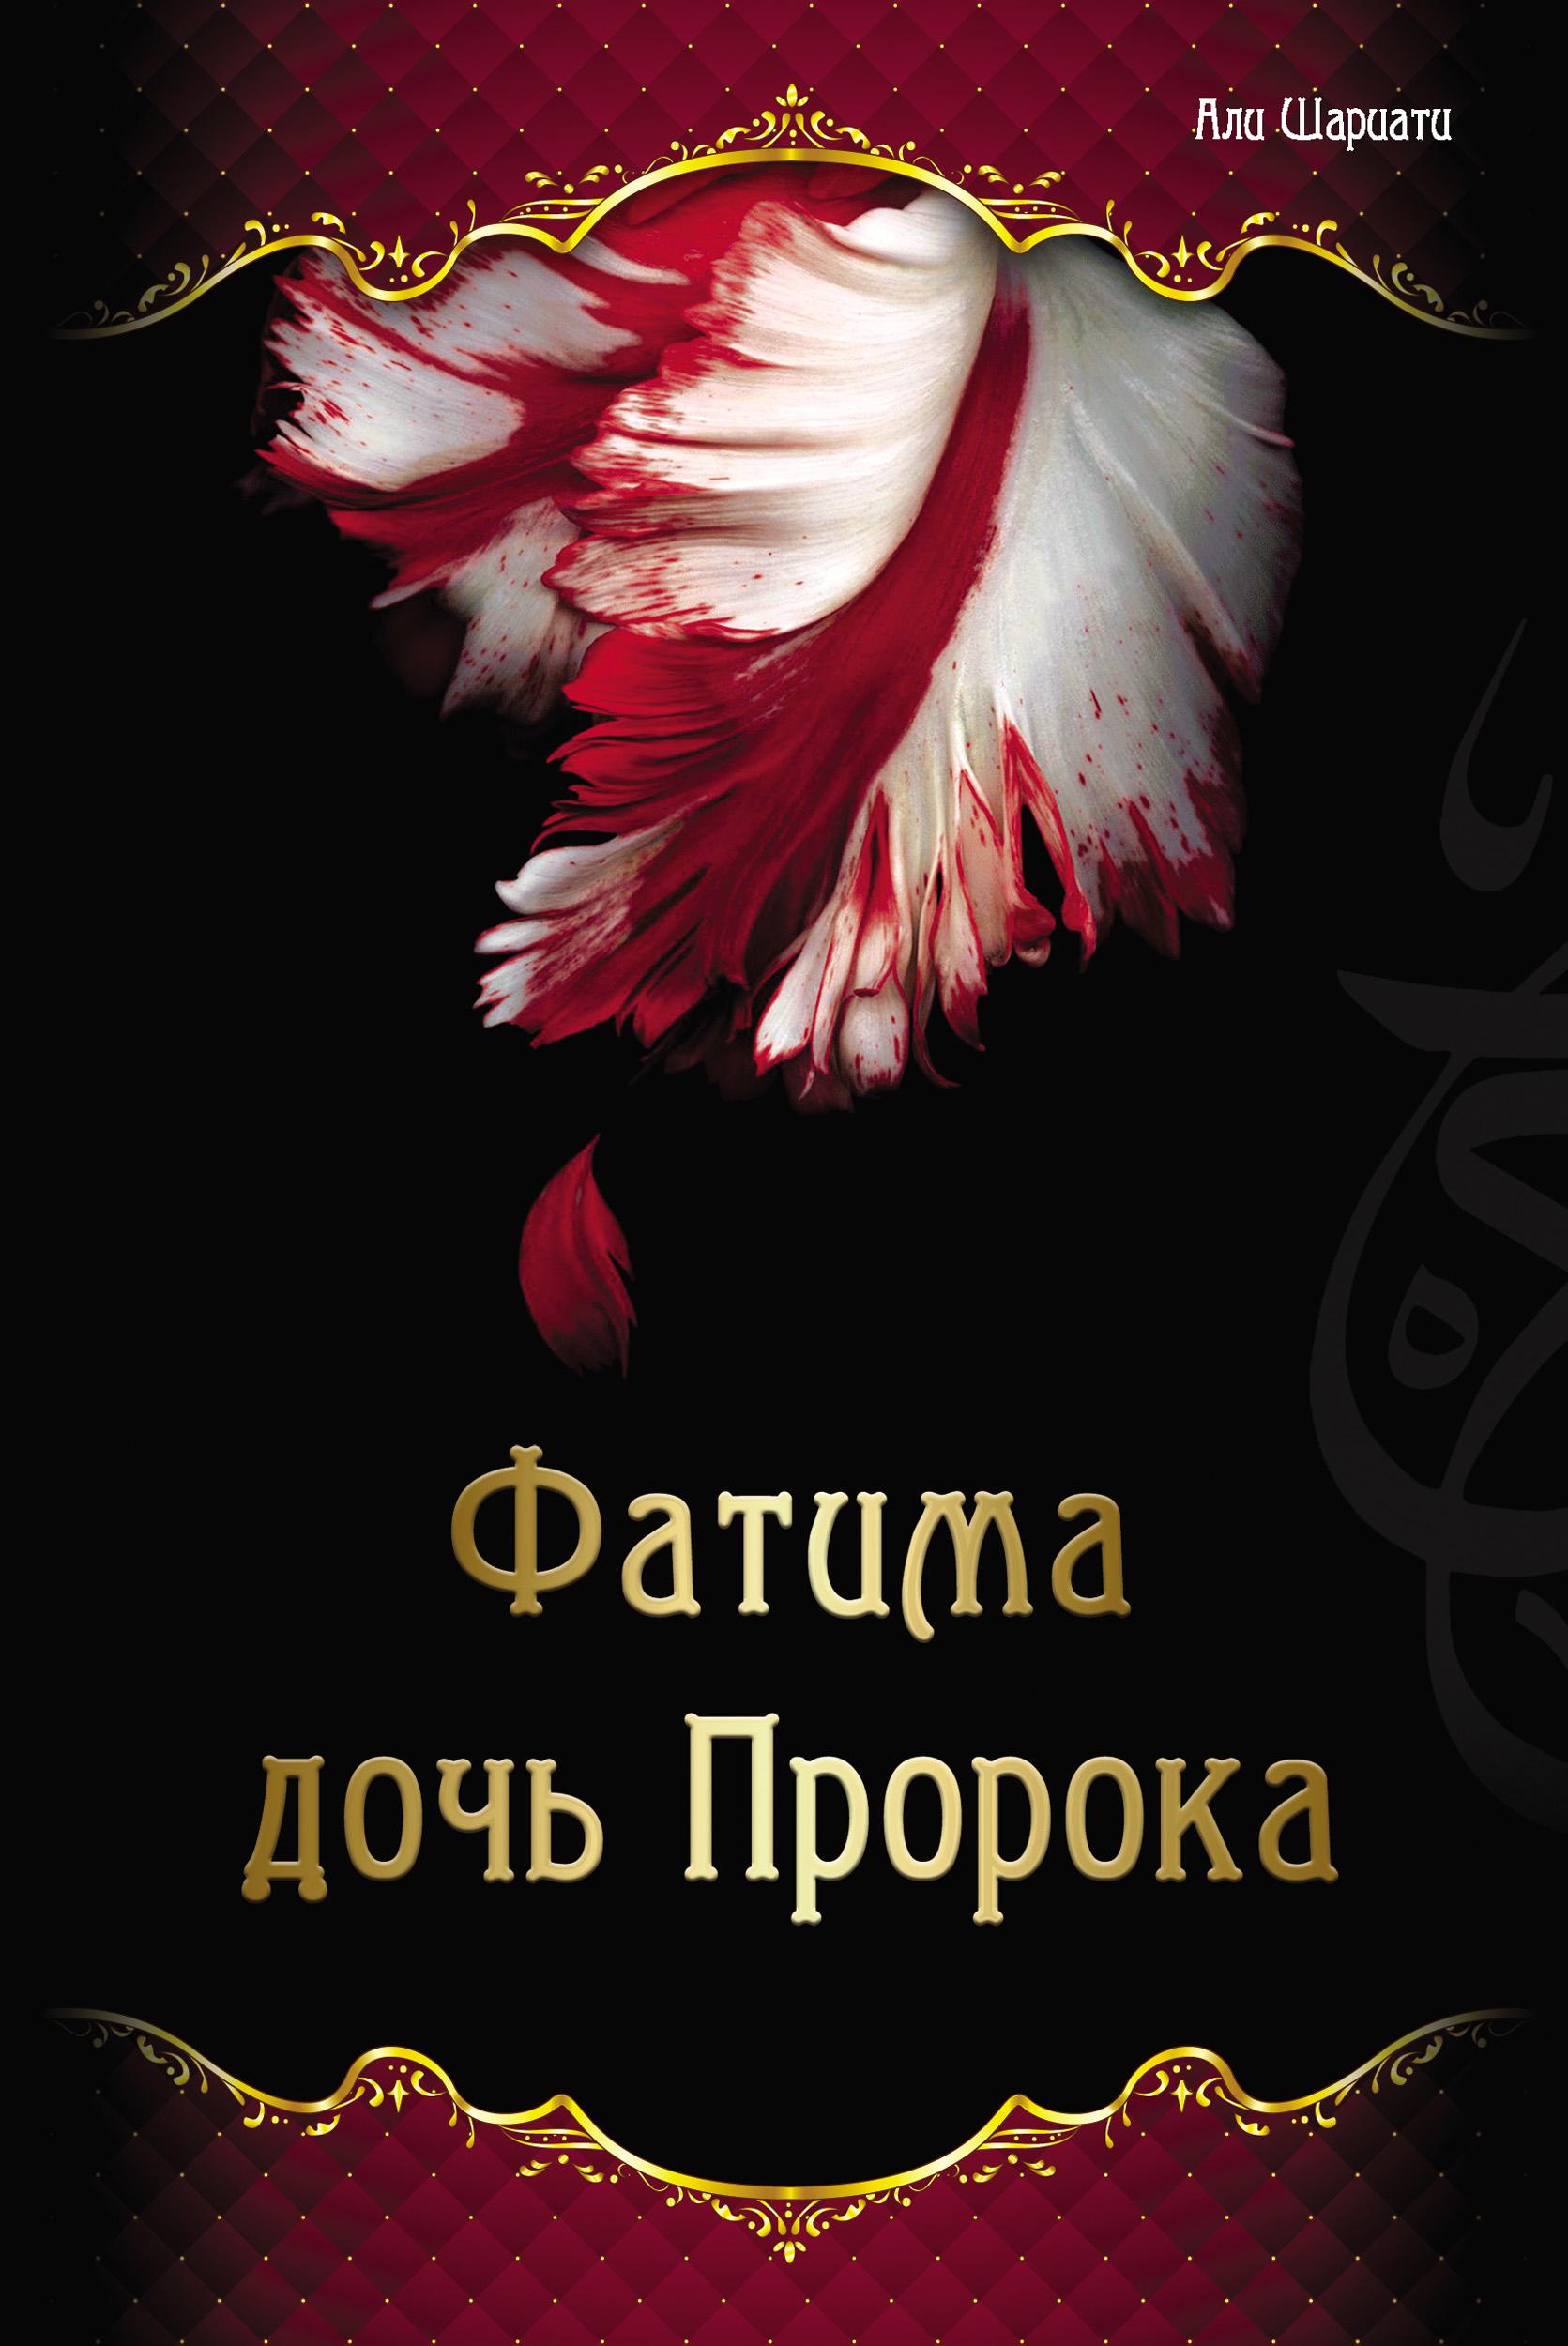 Фатима – дочь Пророка